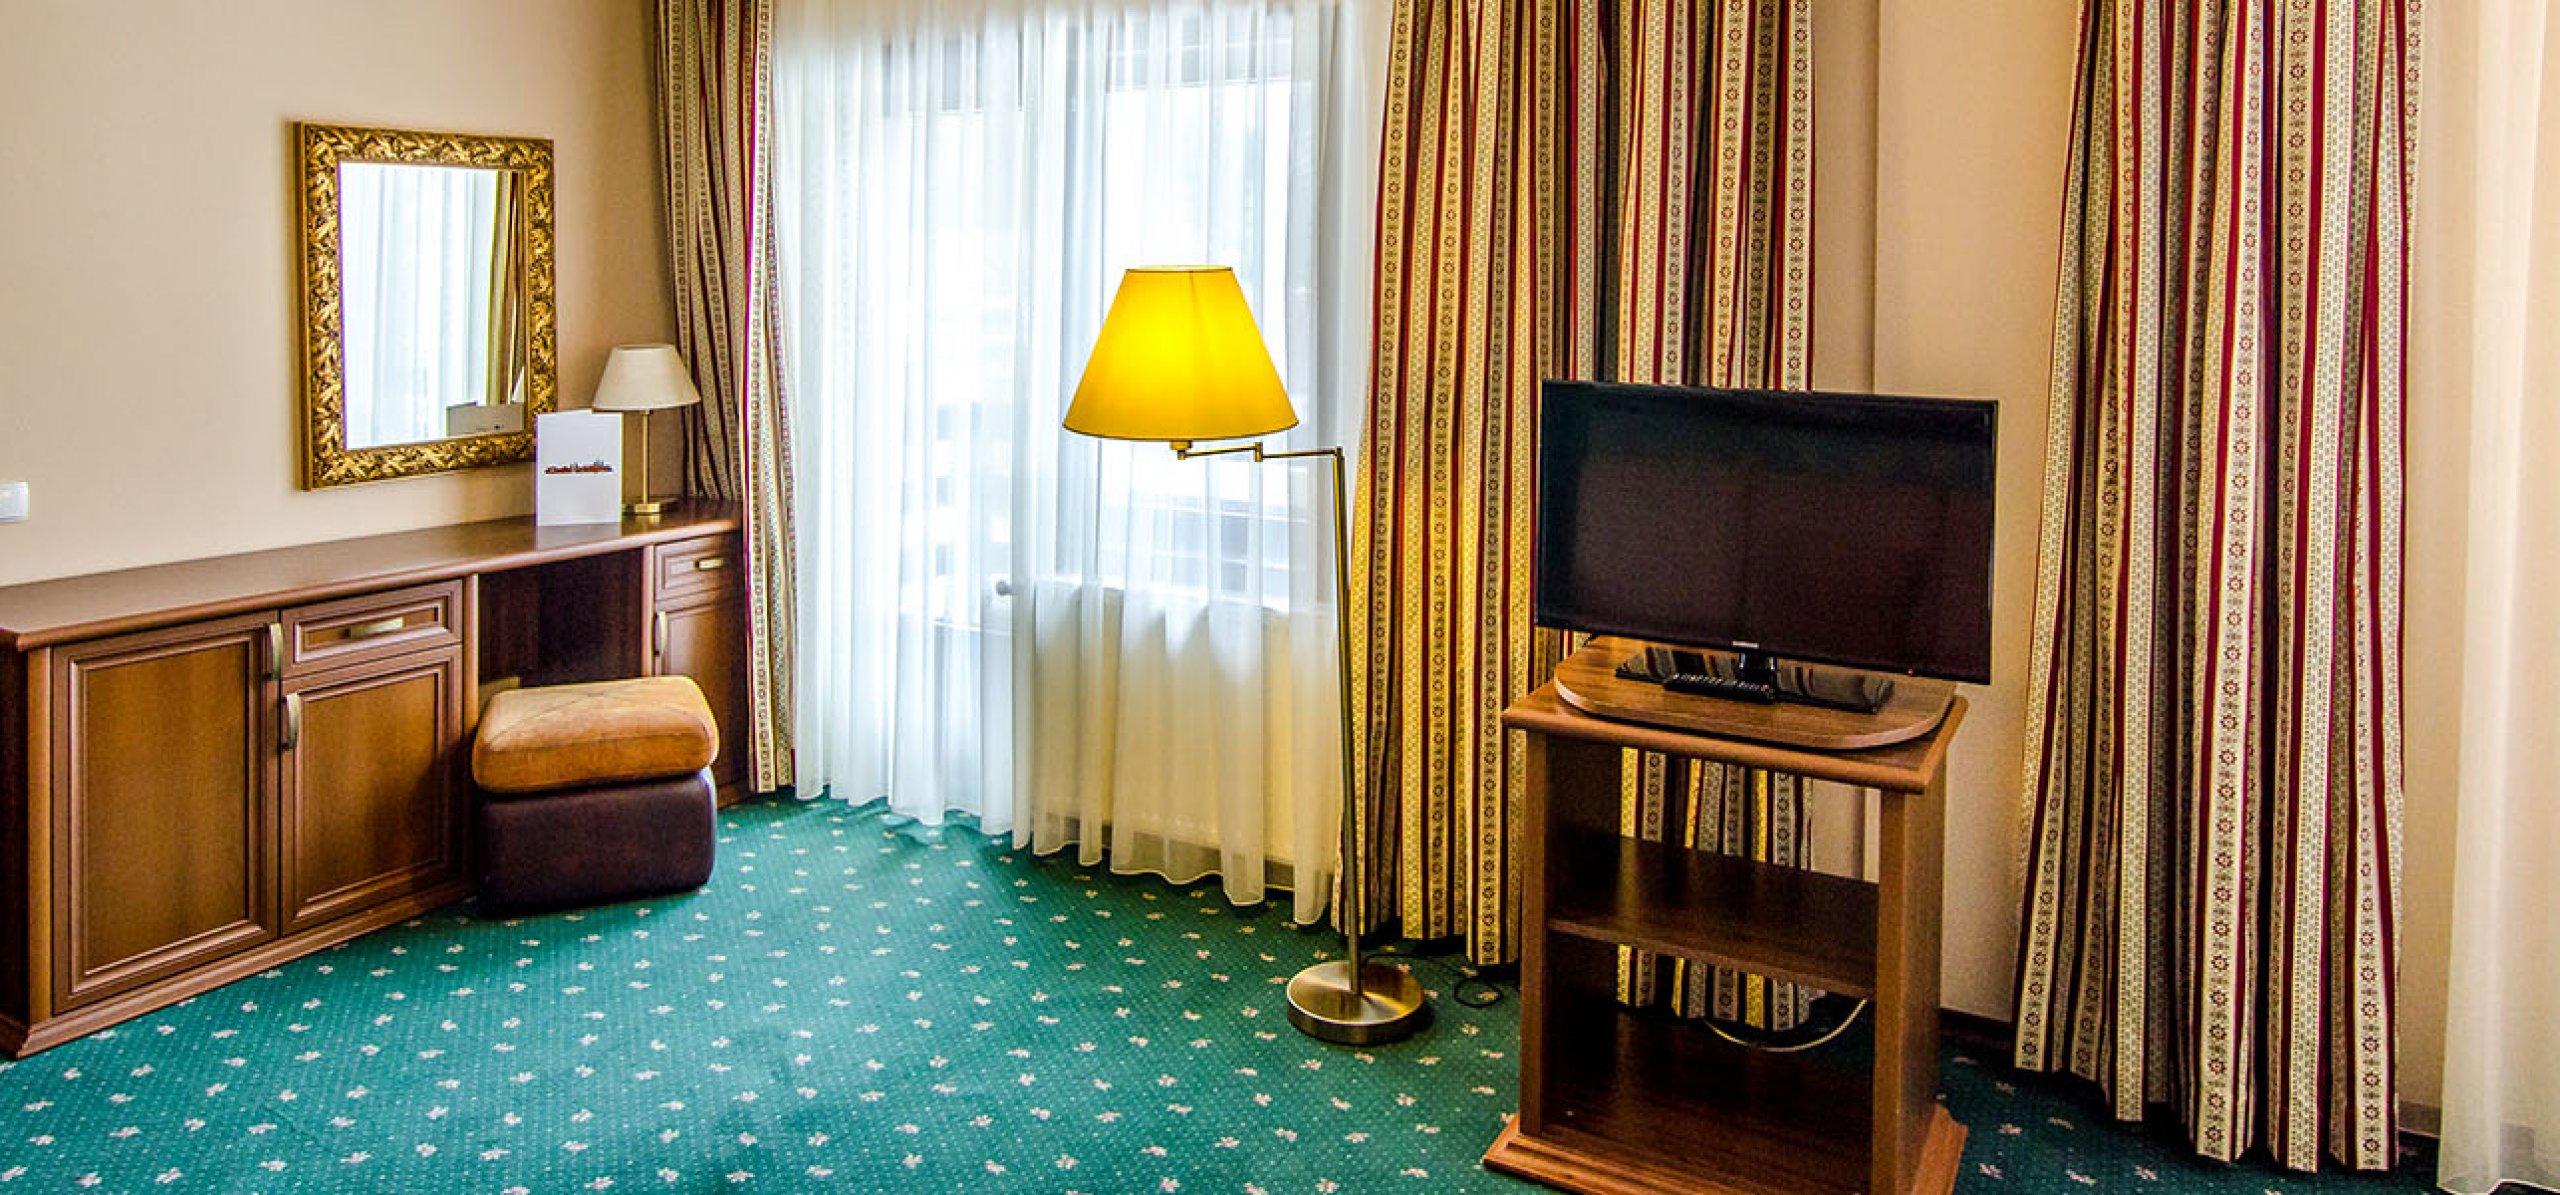 camera-dubla-matrimoniala-vedere-panoramica-vila-ana-vile-moeciu-2